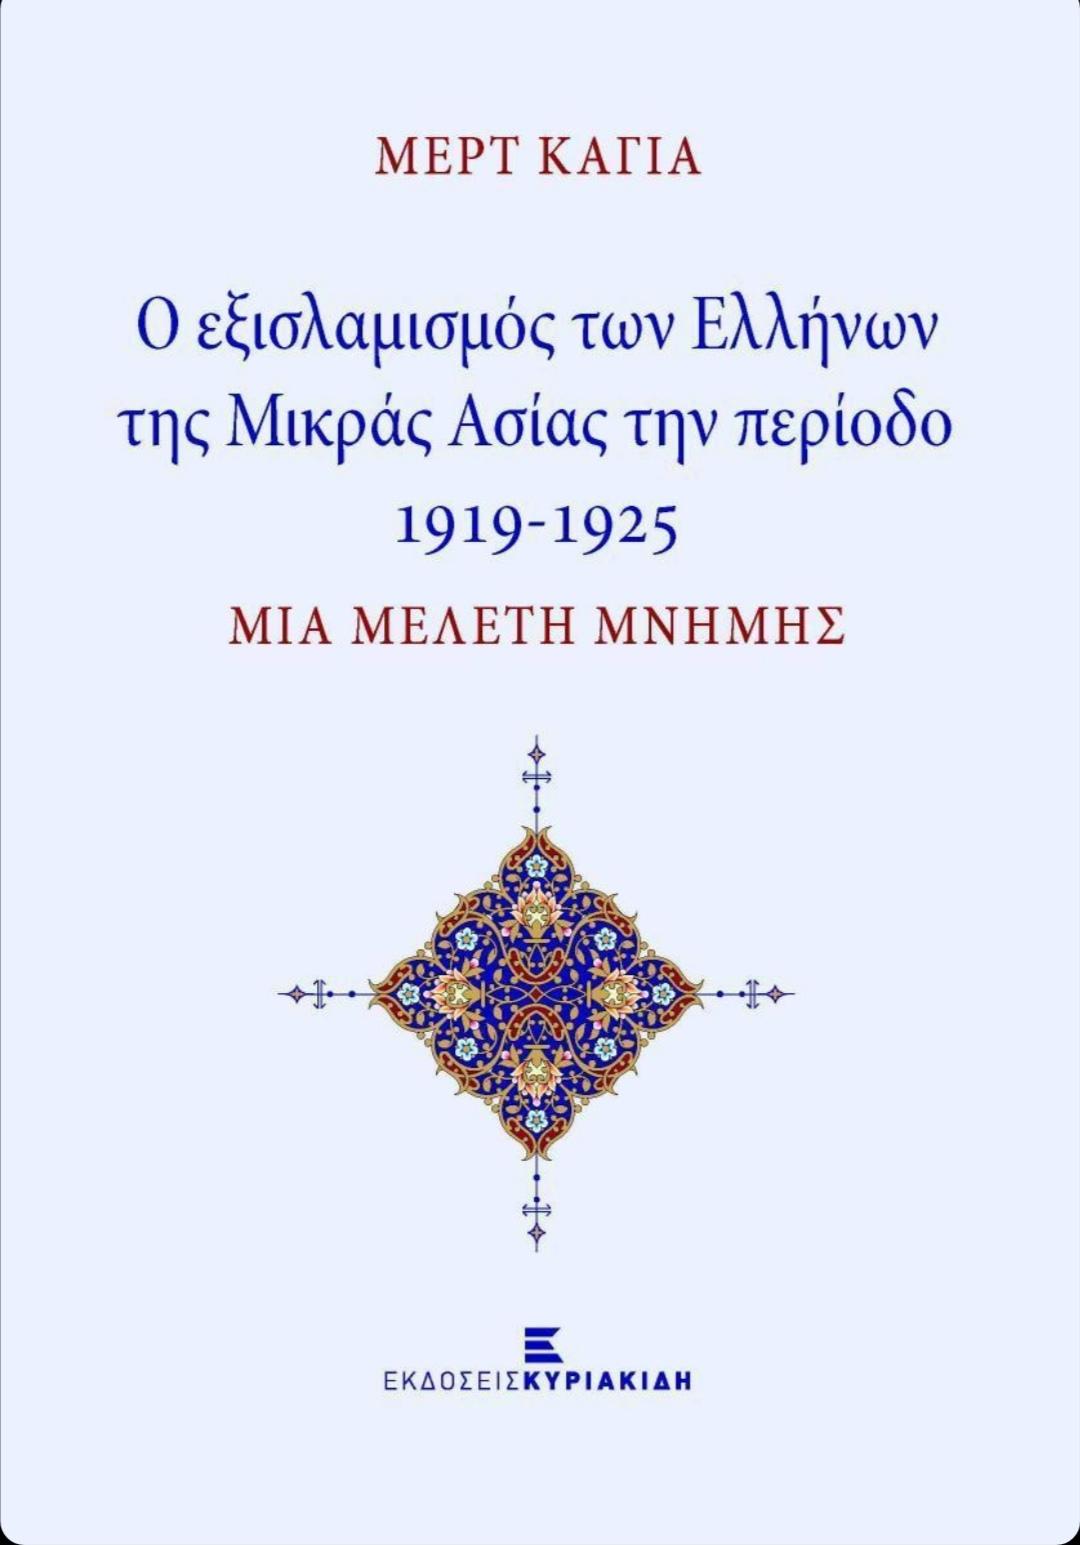 Mert Kaya: Greeks must know someone is working for Islamized Greeks in Turkey 3